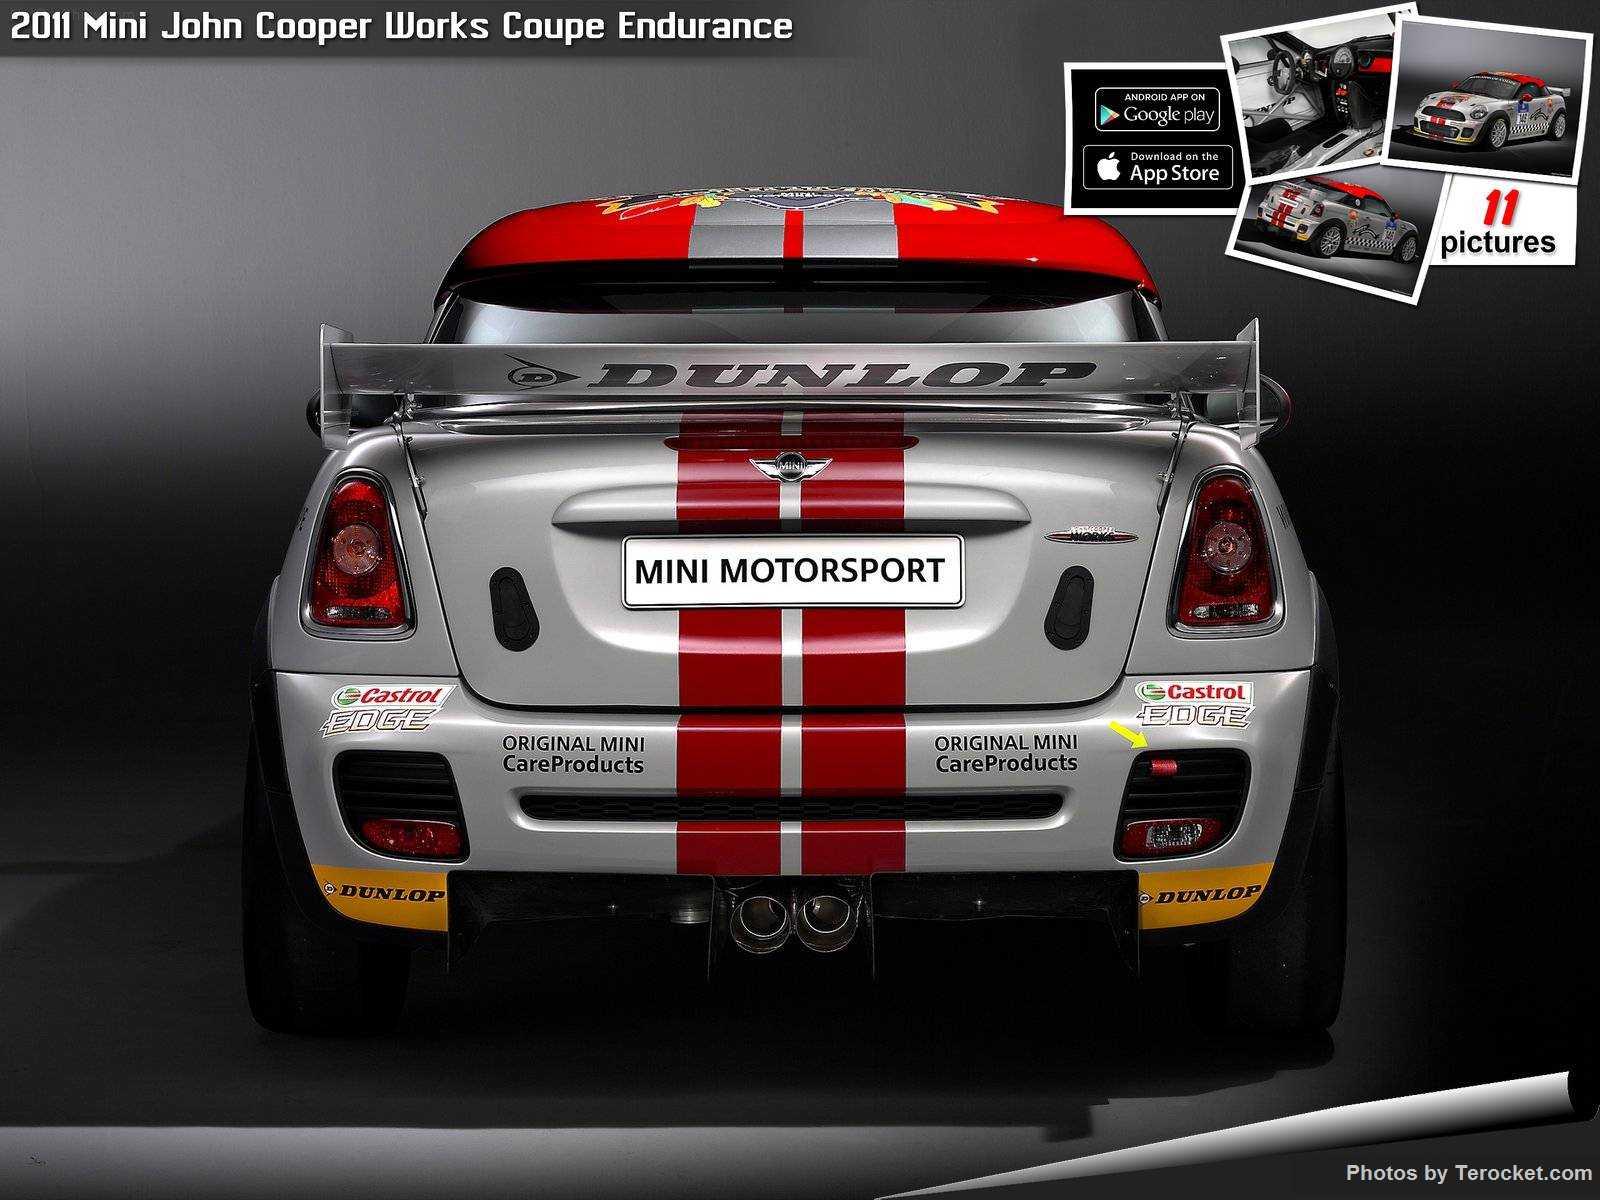 Hình ảnh xe ô tô Mini John Cooper Works Coupe Endurance 2011 & nội ngoại thất